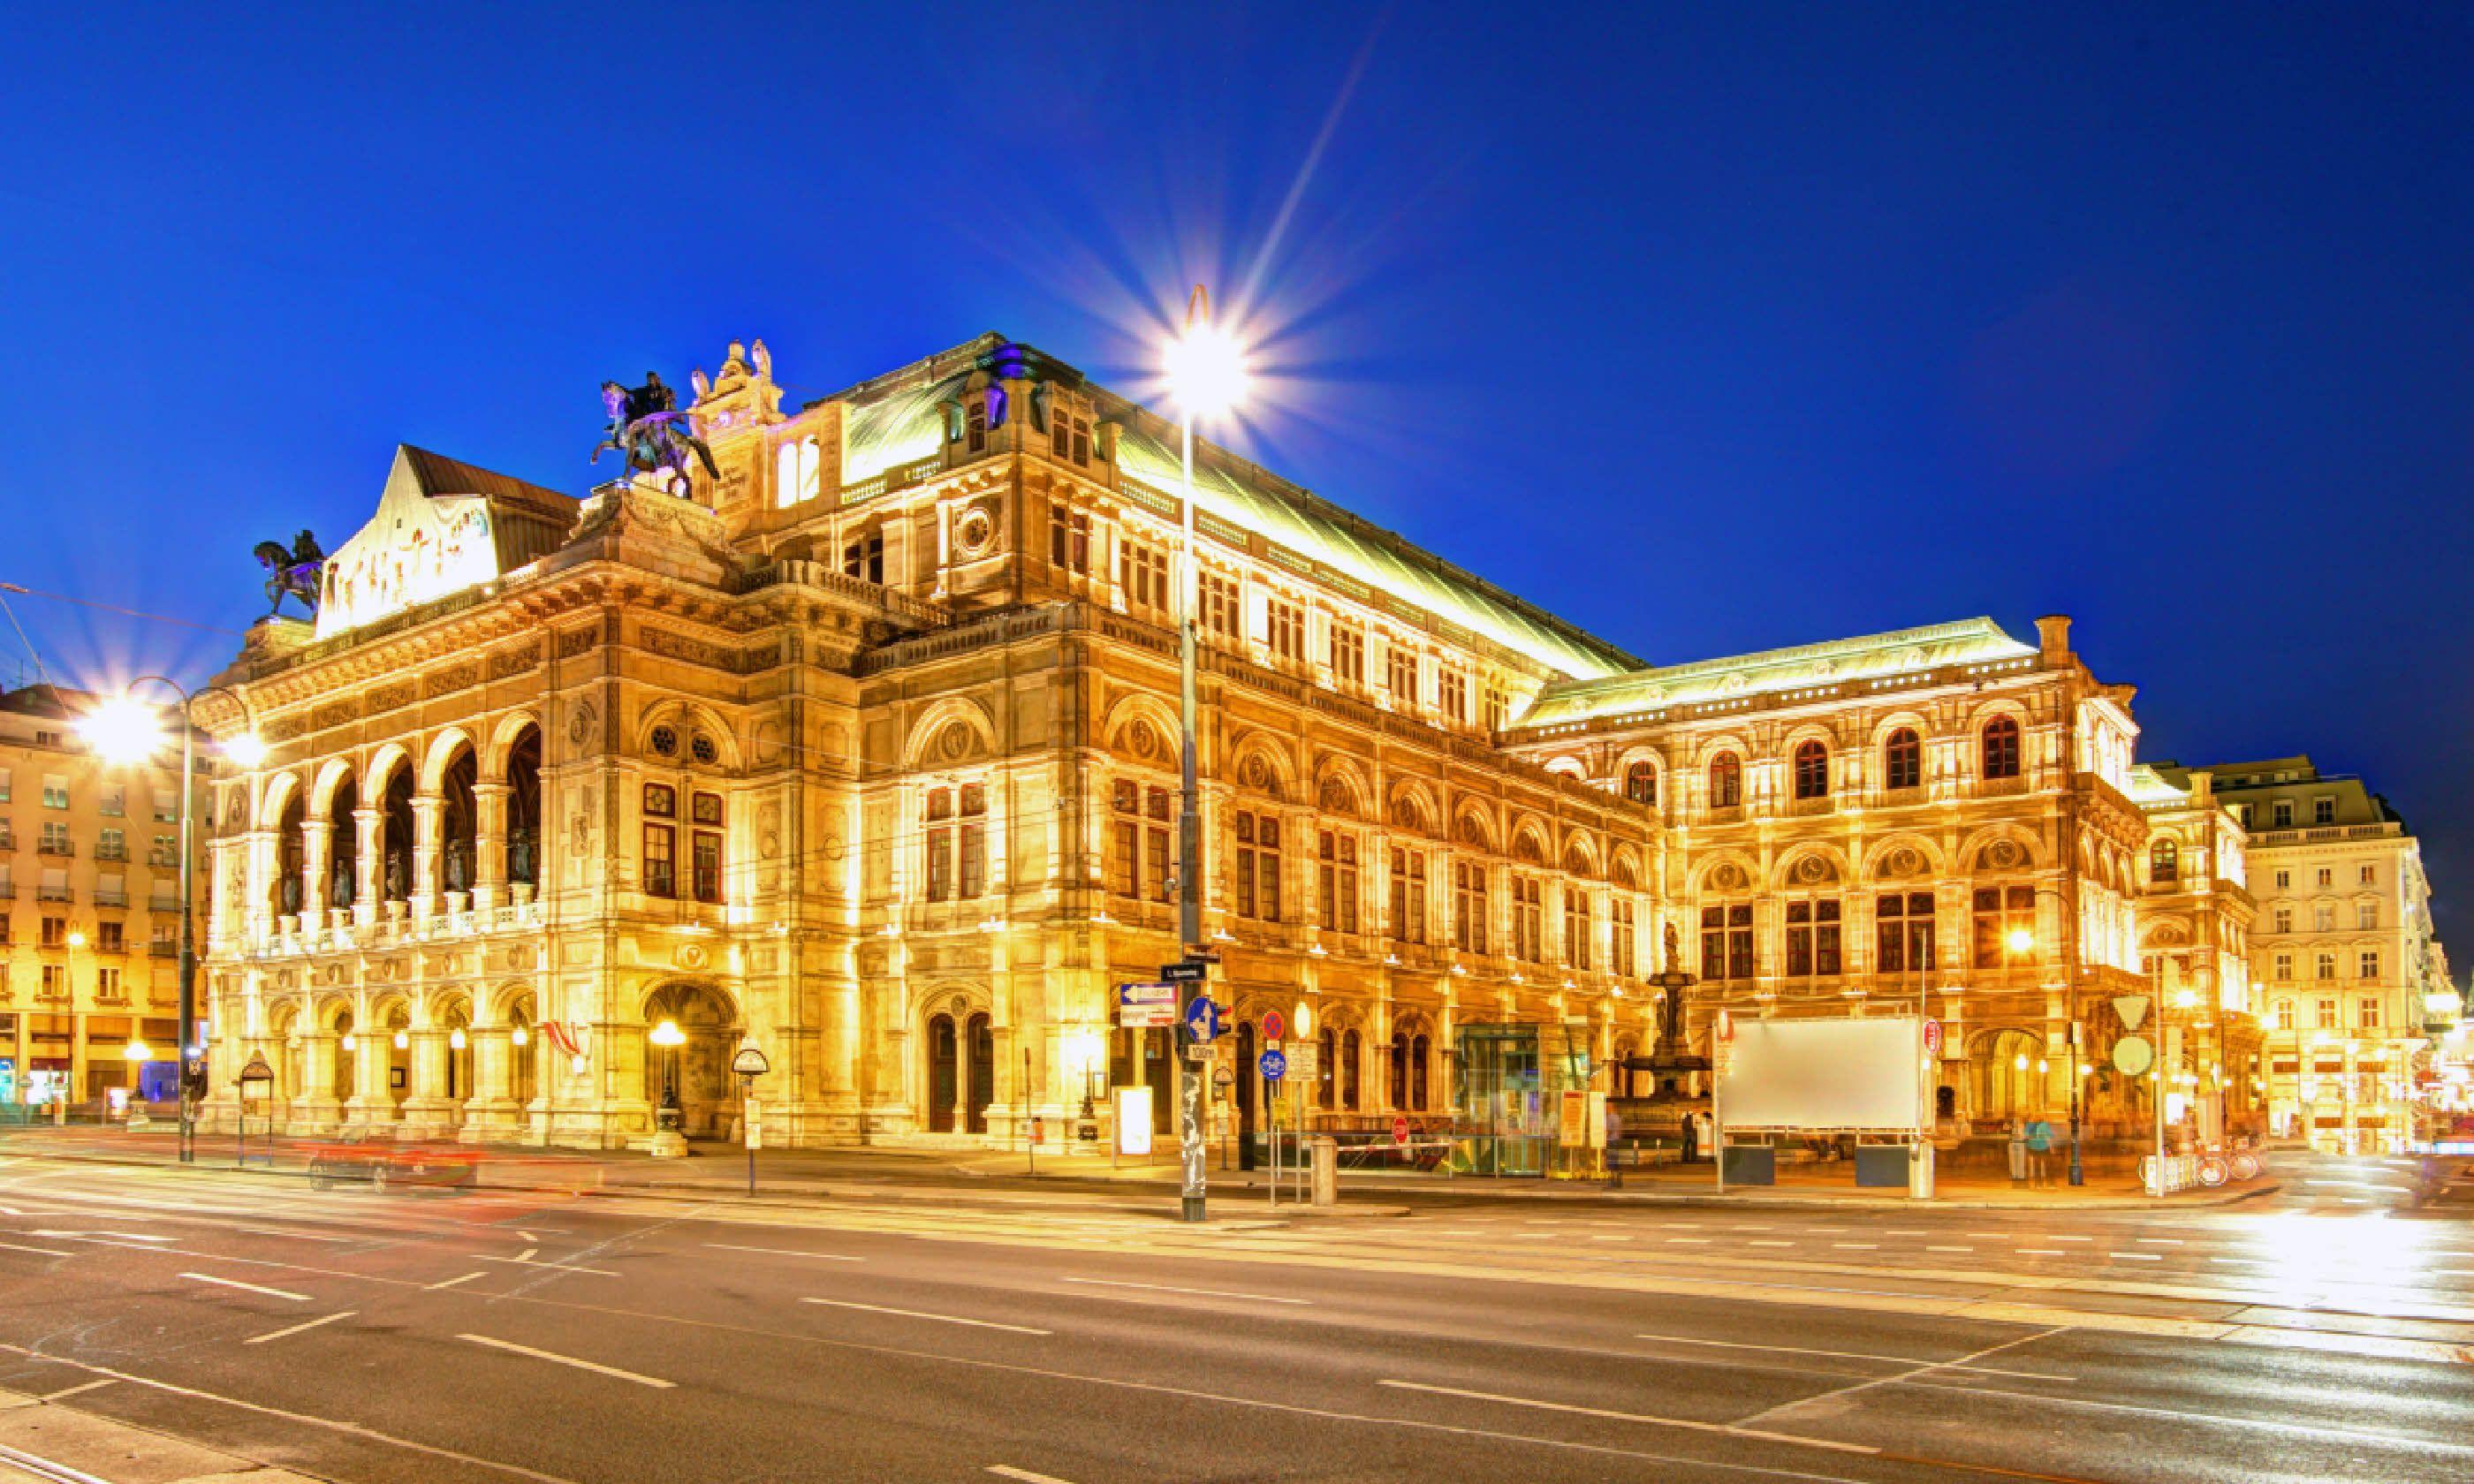 Vienna State Opera House (Dreamstime)